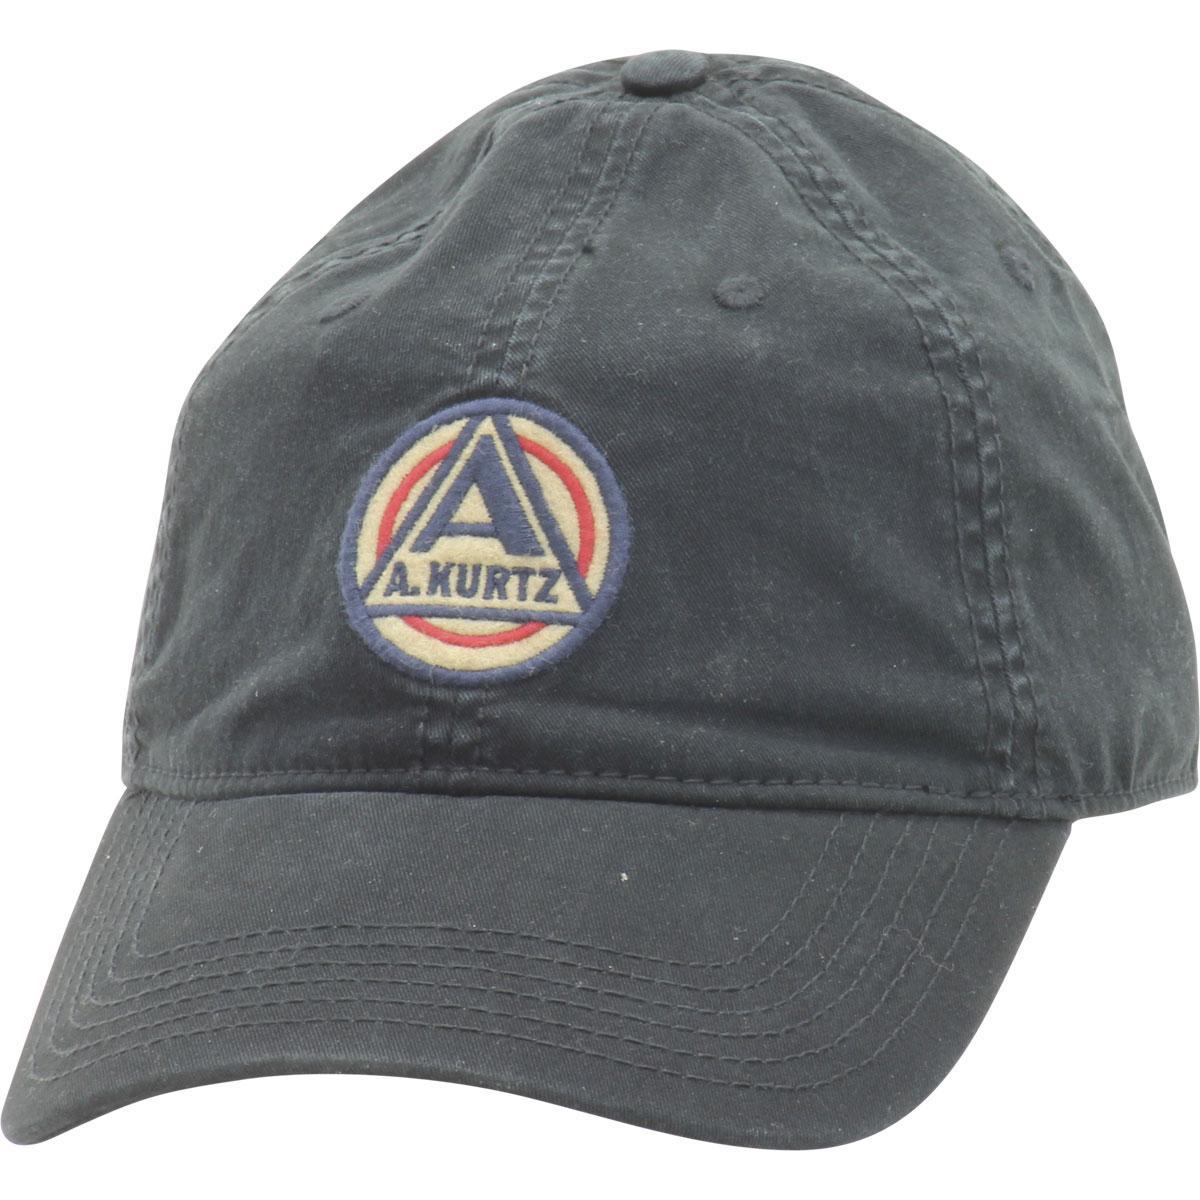 3763351fd37 Kurtz Men s AKurtz Patch Flex Baseball Cap Hat